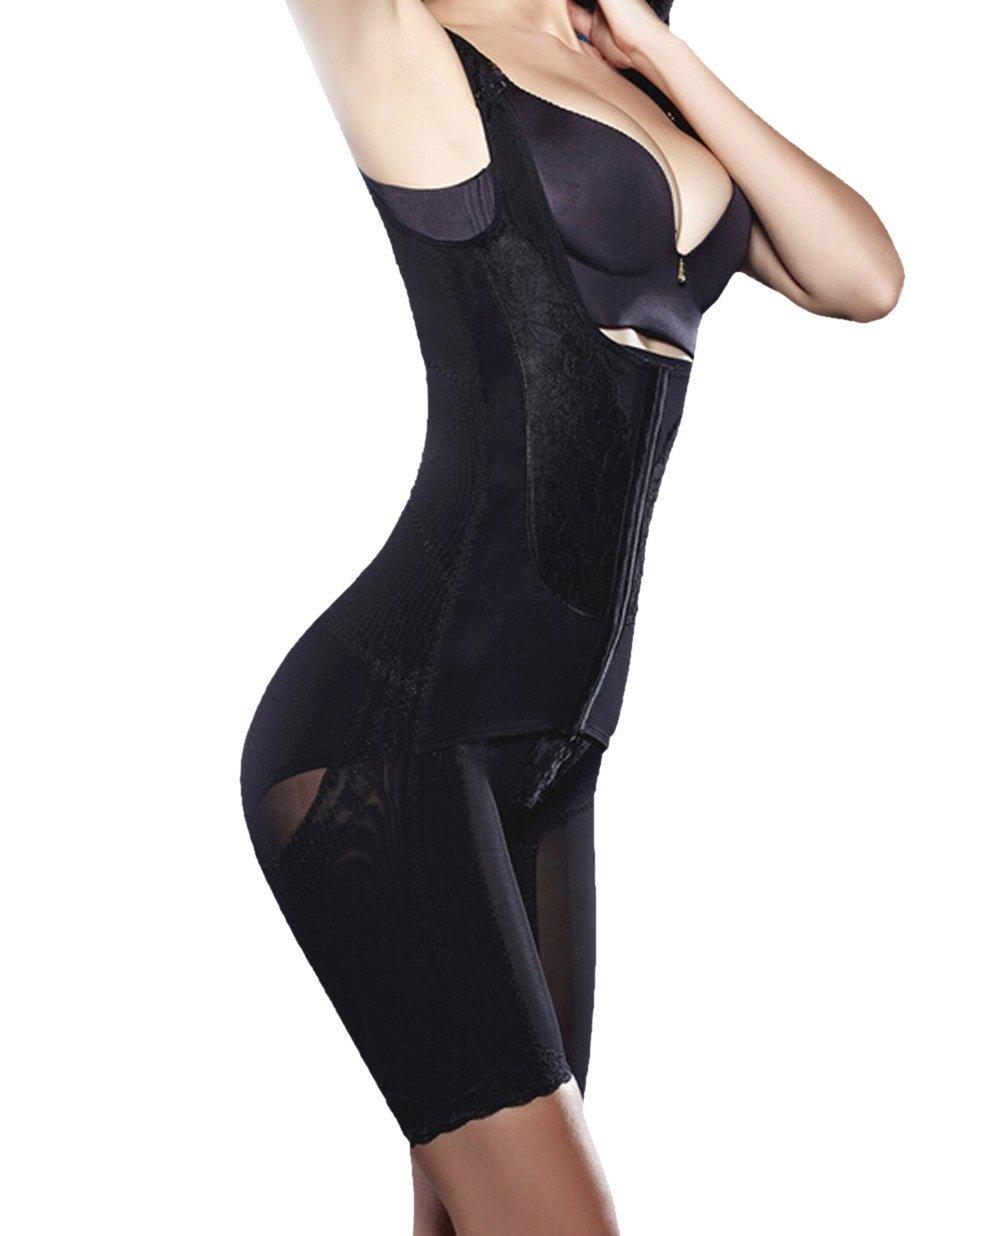 TININNA Body Faja Modeladora Reductora Full Body Shaper Sin Costuras para Recuperación Post-Parto para Mujeres.-Negro XXXL: Amazon.es: Hogar